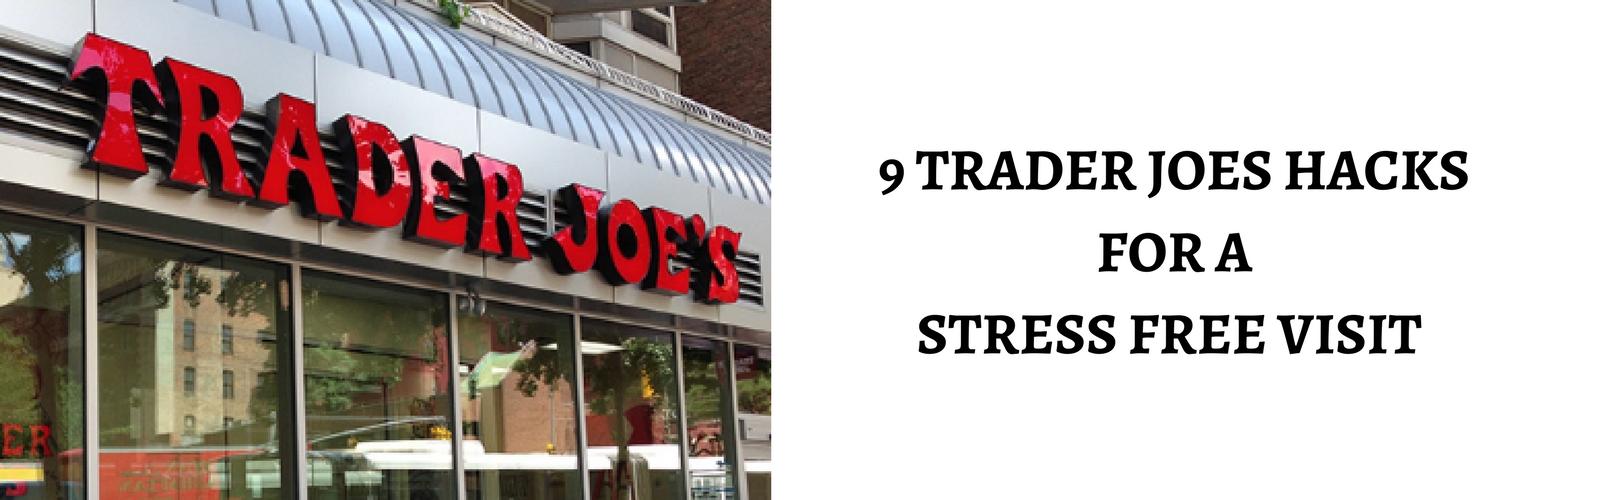 9 trader joes hacks for a stress free visit